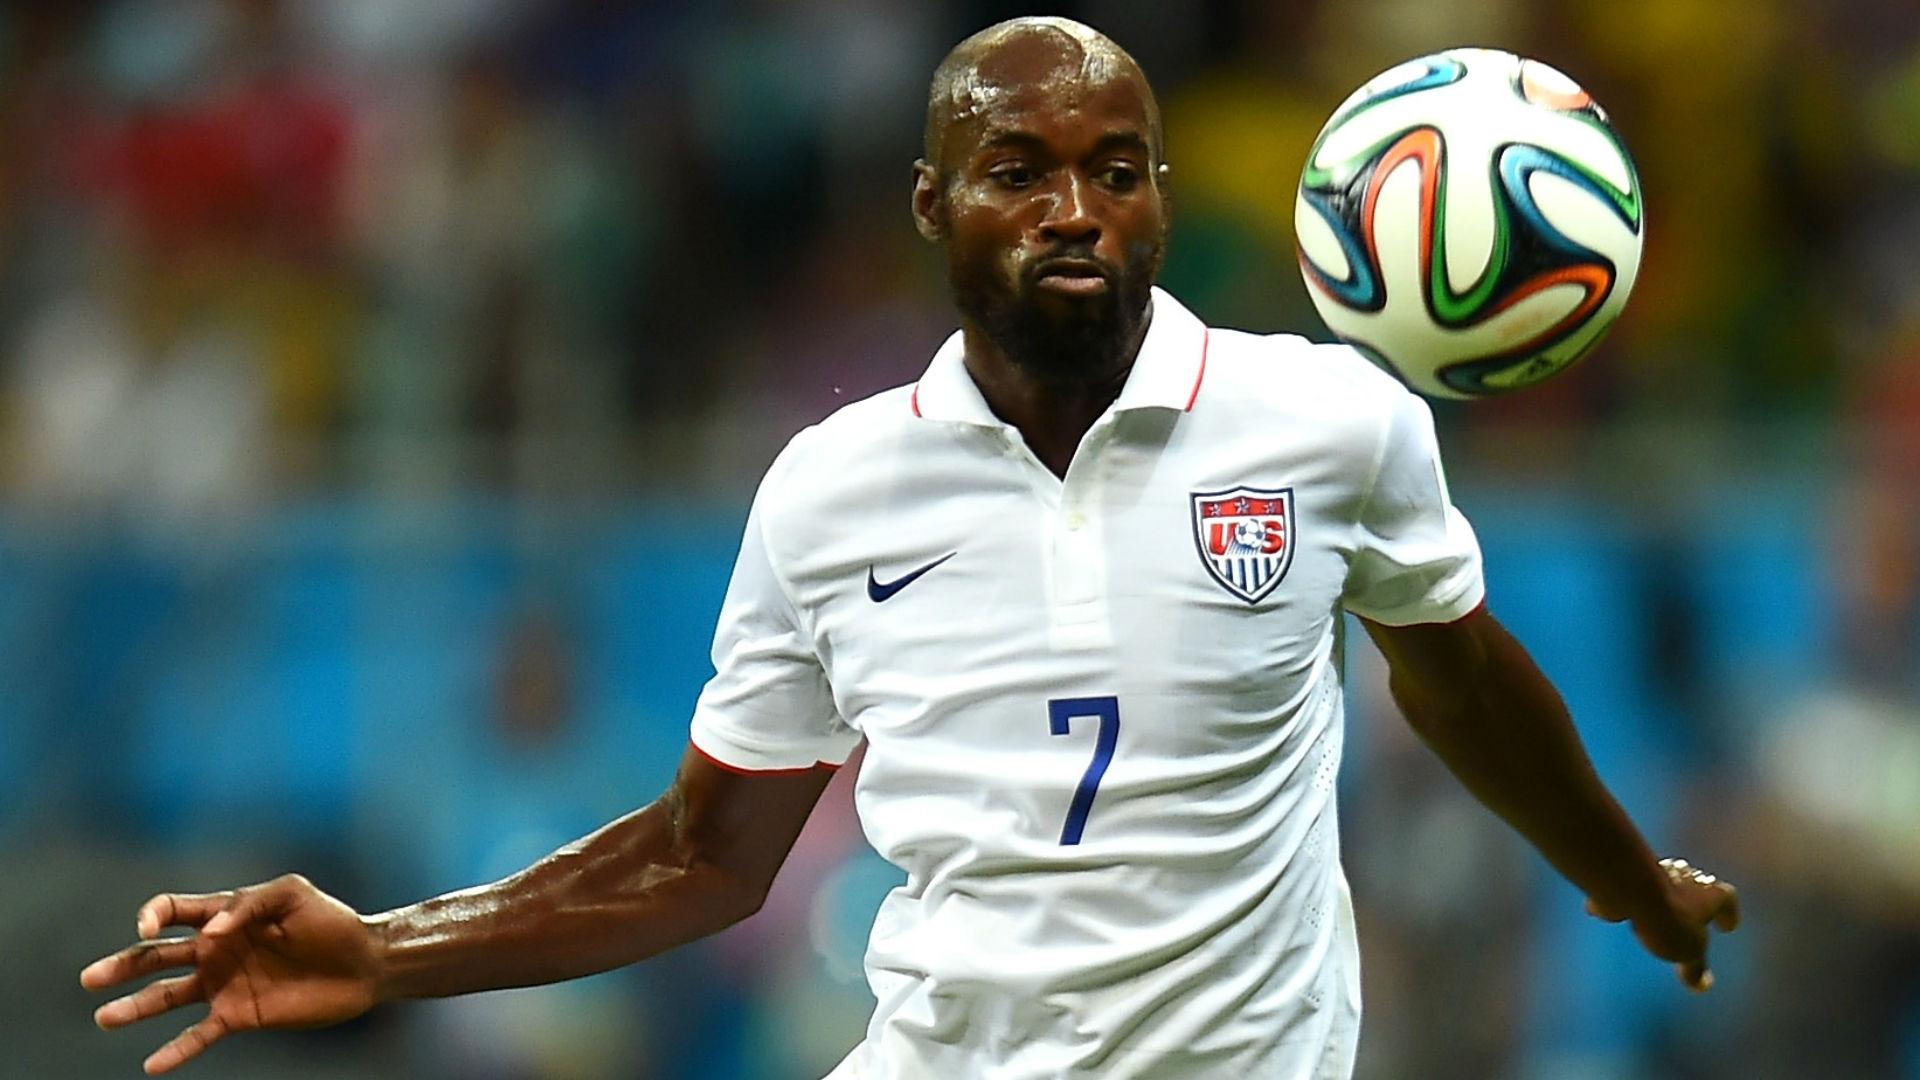 Longtime U.S. national team, MLS stalwart DaMarcus Beasley to retire